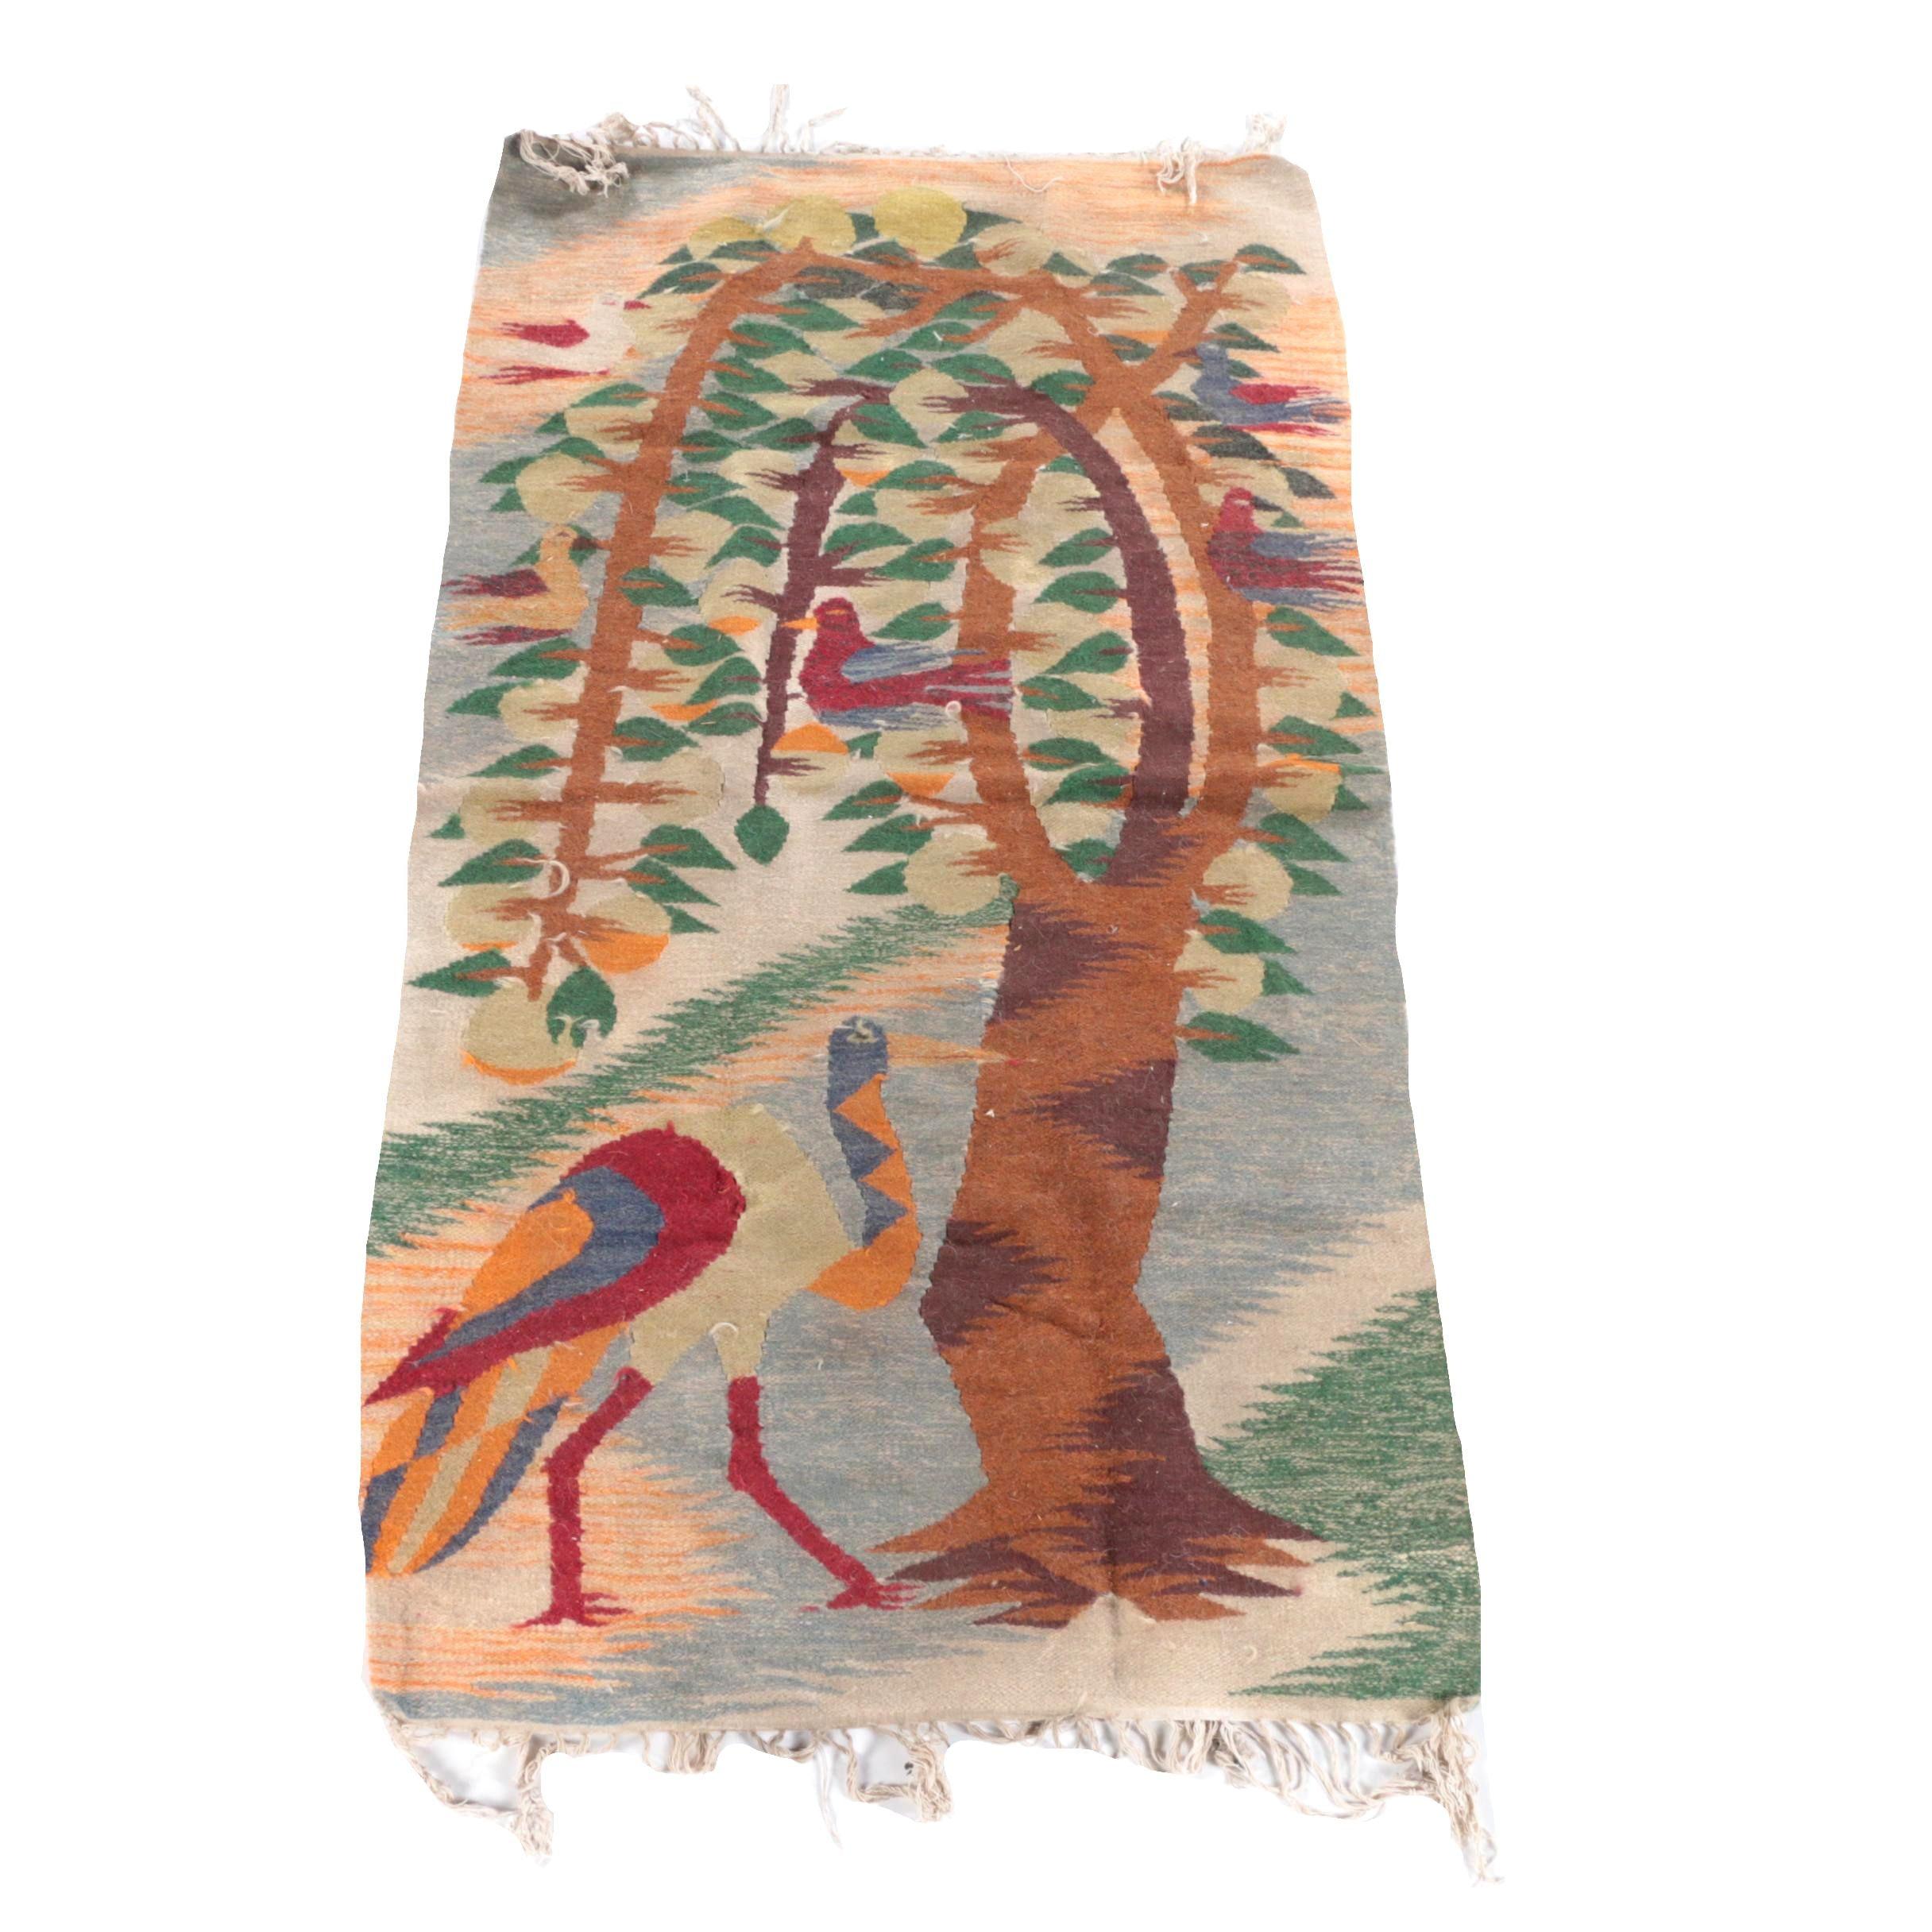 Handwoven Scandinavian-Style Pictorial Wool Kilim